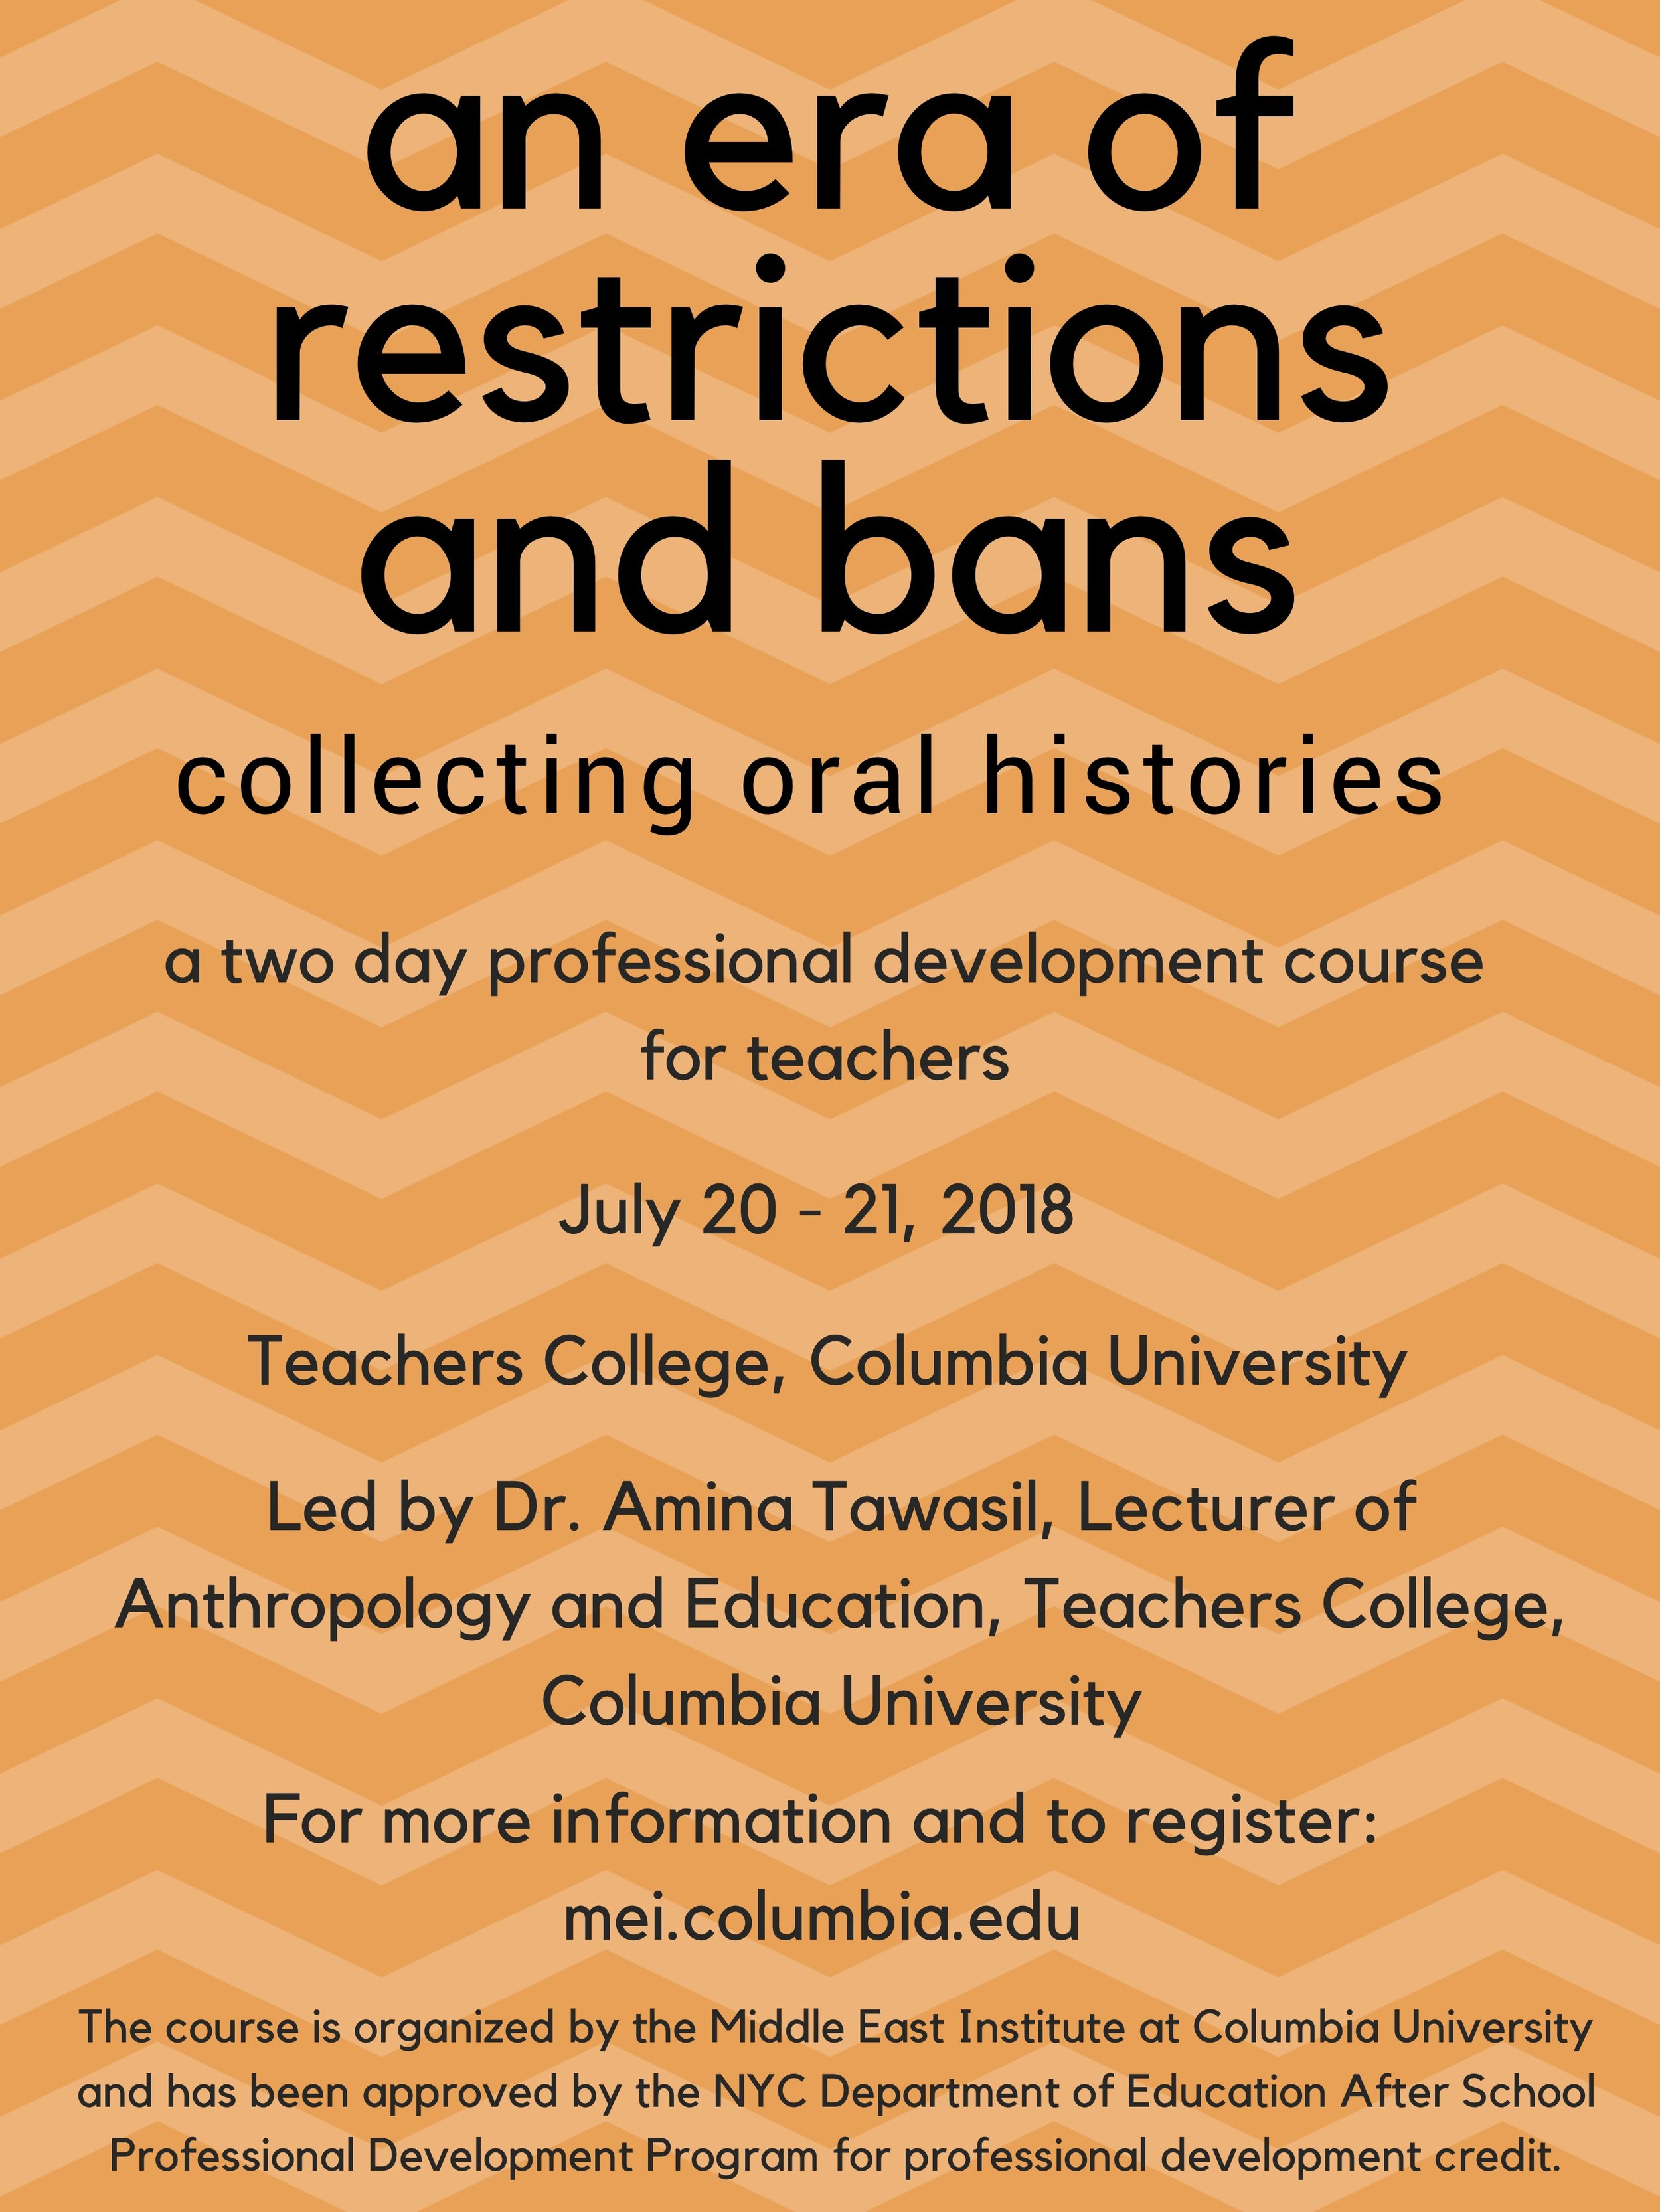 era of restrictions.jpg